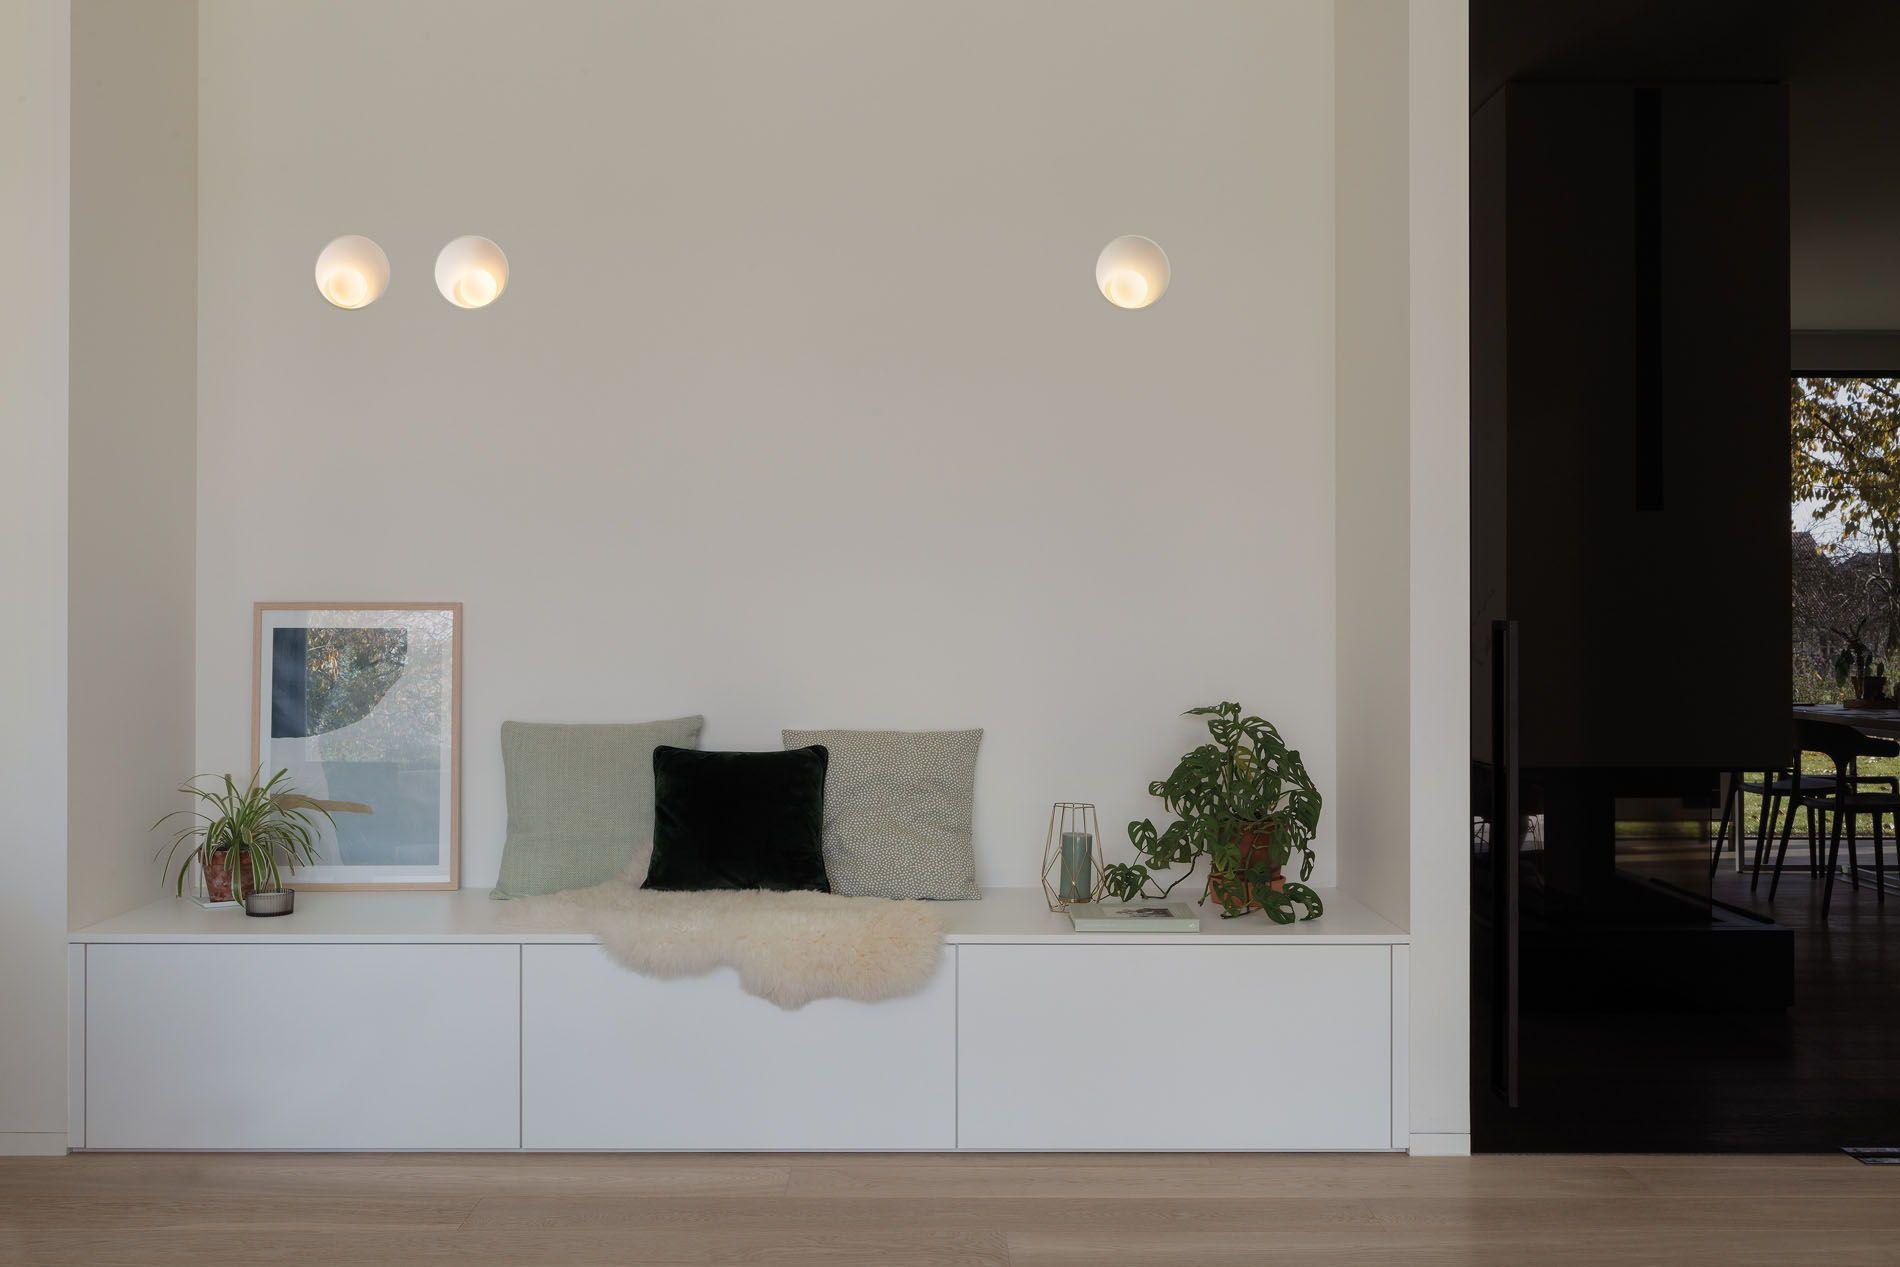 Livingroom Lighting Ideas Shellby Living Room Lighting Wall Lighting Design Interior Design Inspiration